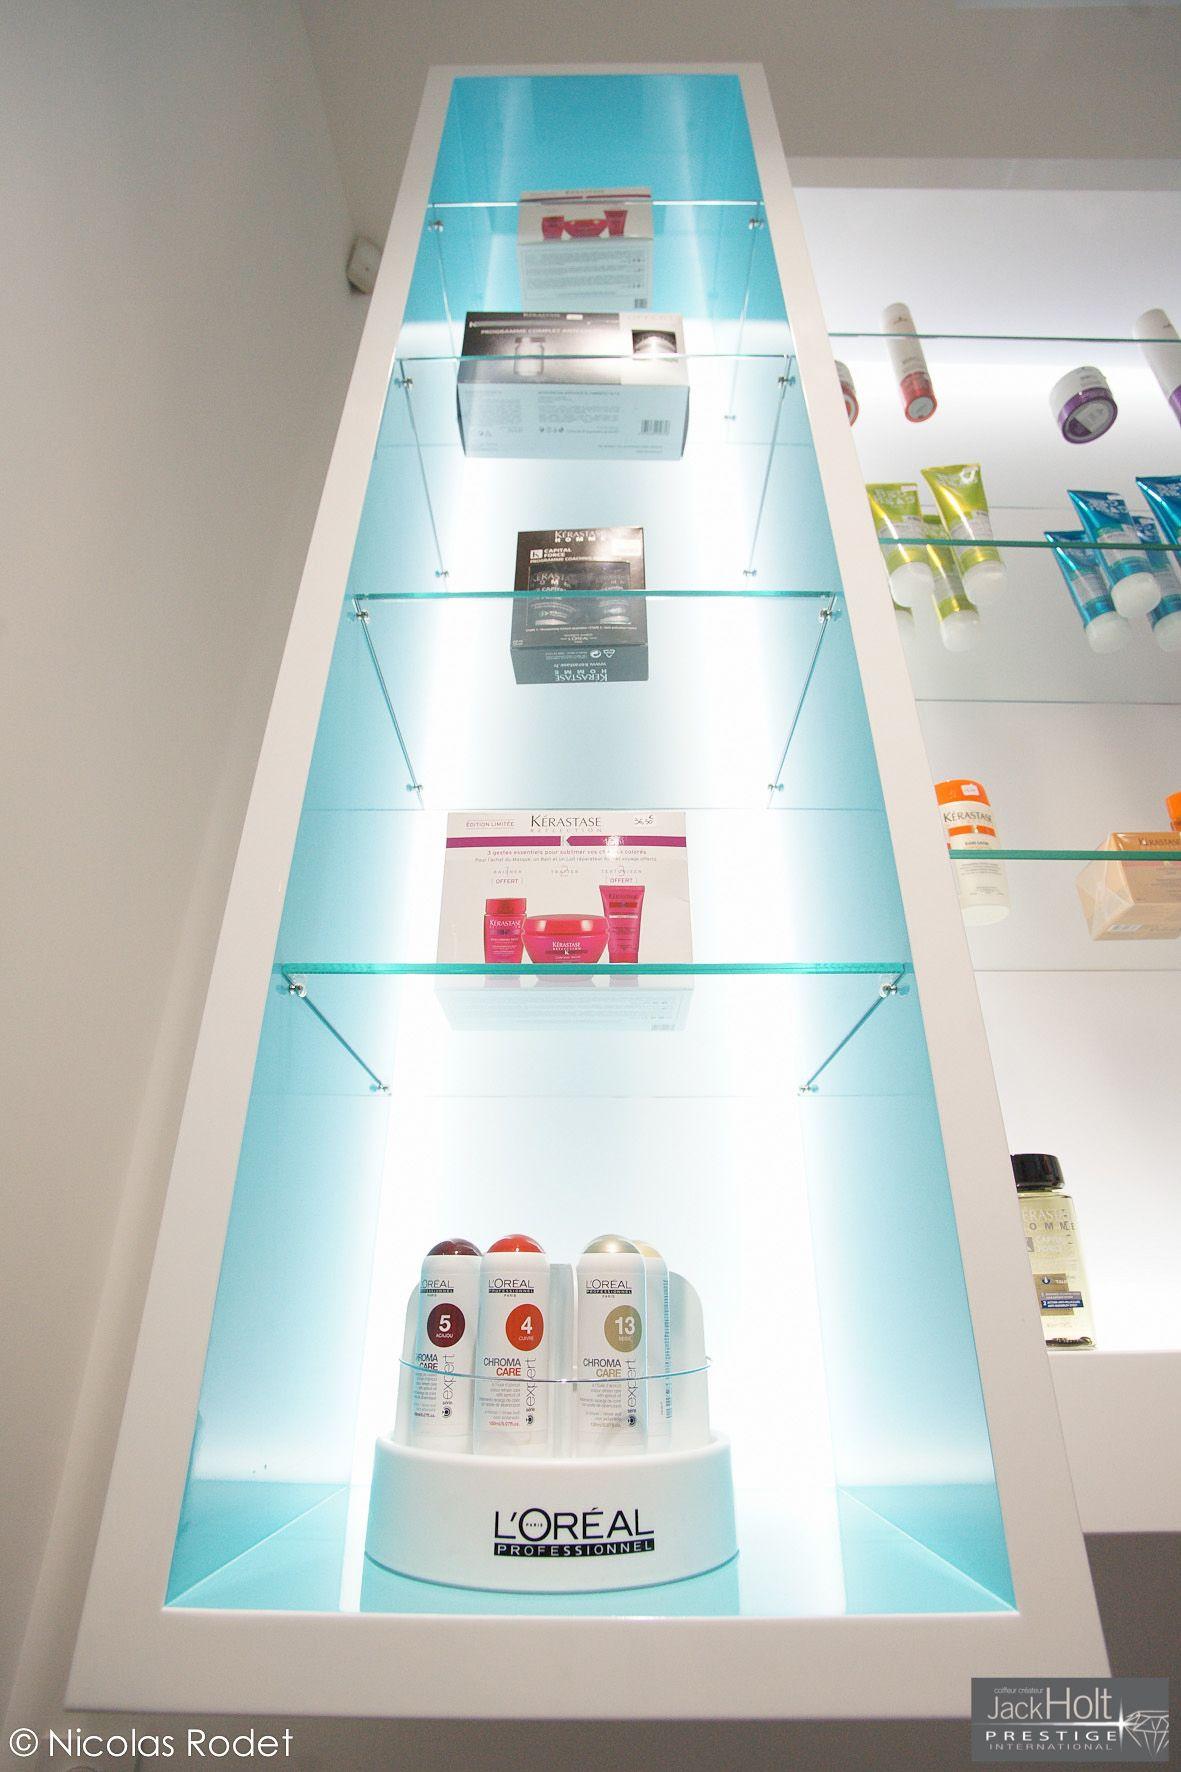 Salon De Coiffure Confidences Prestige Lyon Top Model Rehome Salon De Coiffure Interieur De Salon Salon